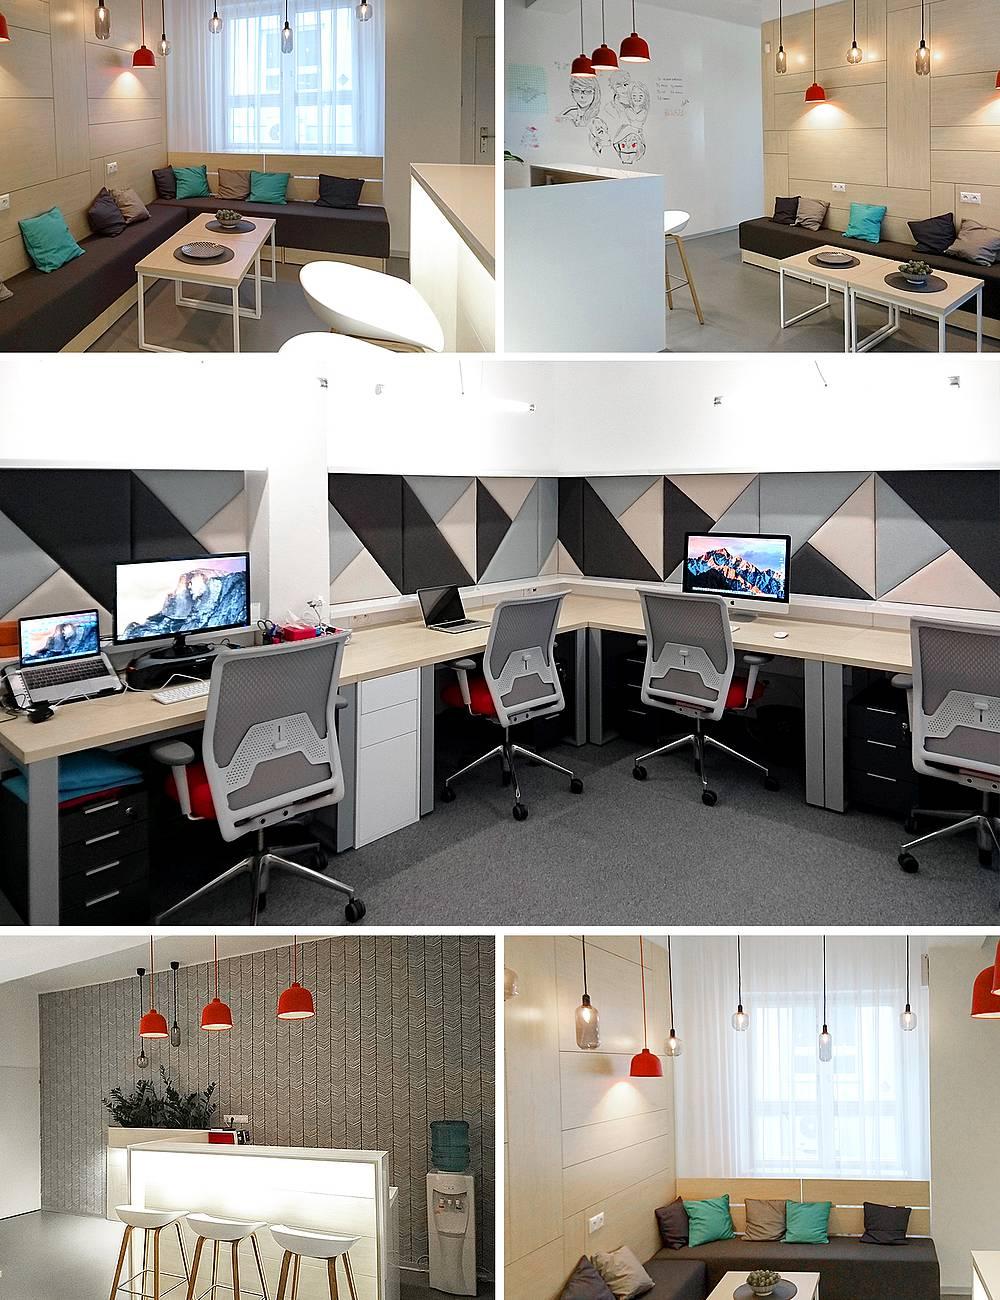 w4_Office_Bratislava_images_385f2b9c48